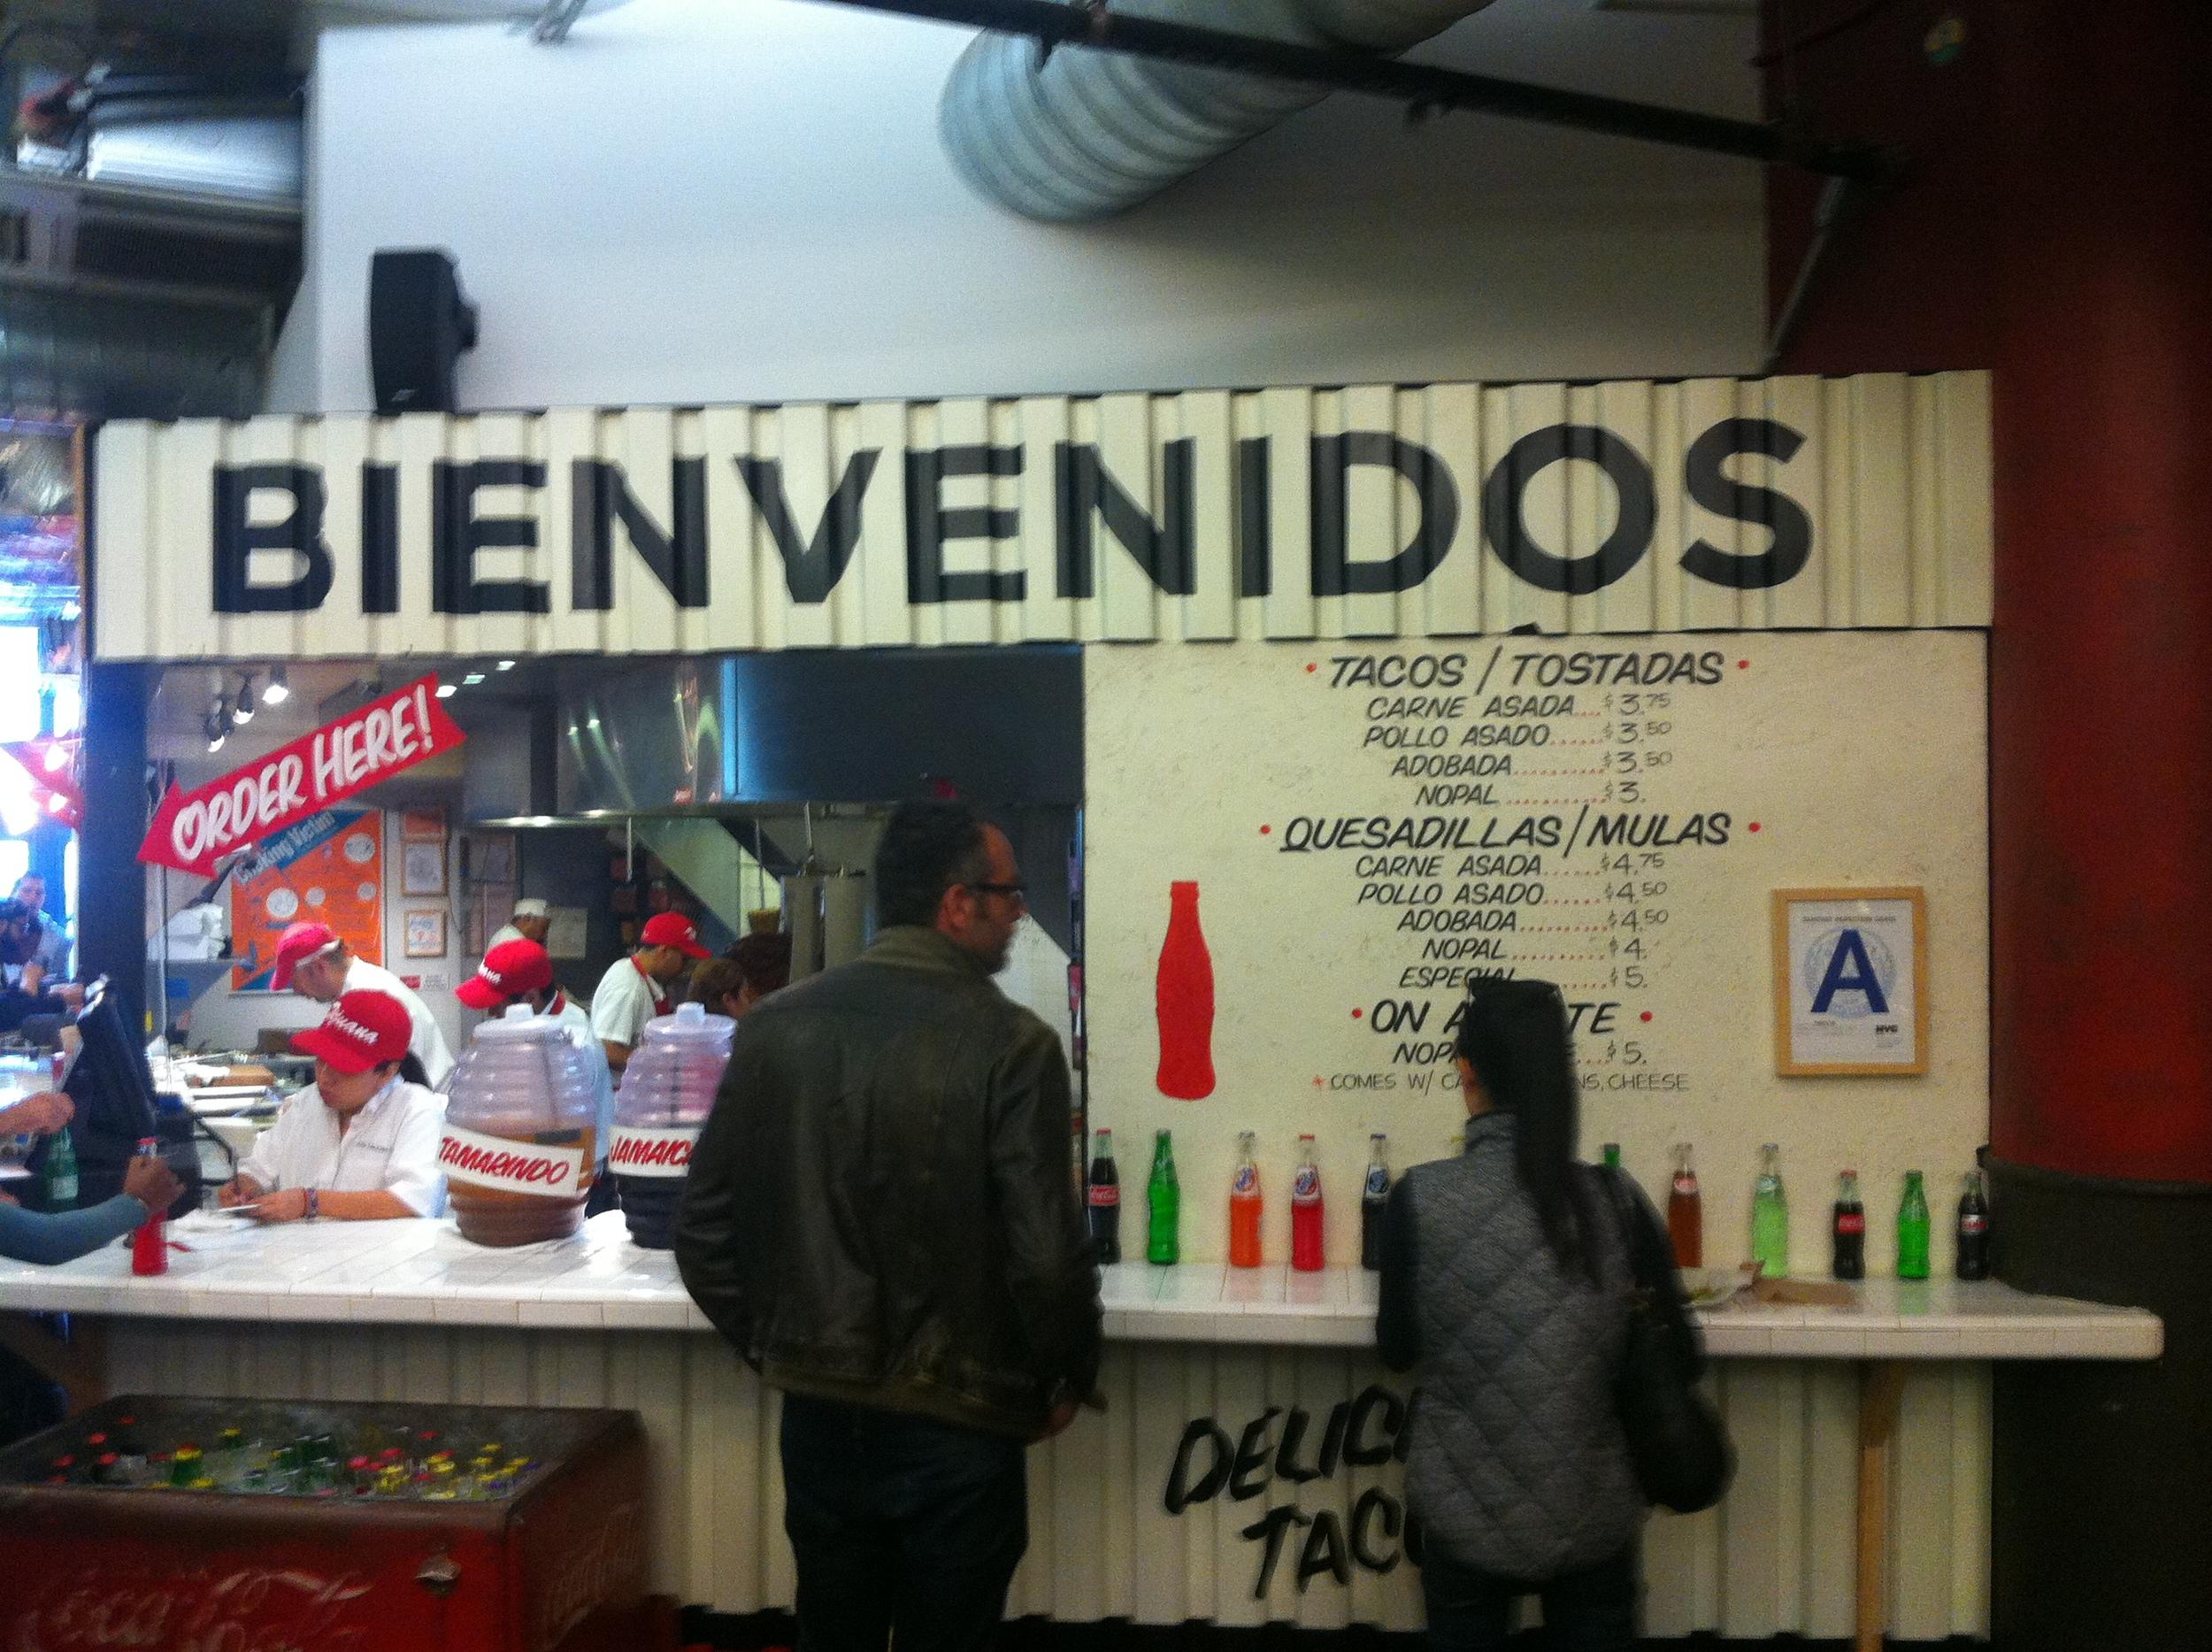 Los Tacos No. 1. Not in Brooklyn or Queens but still good.